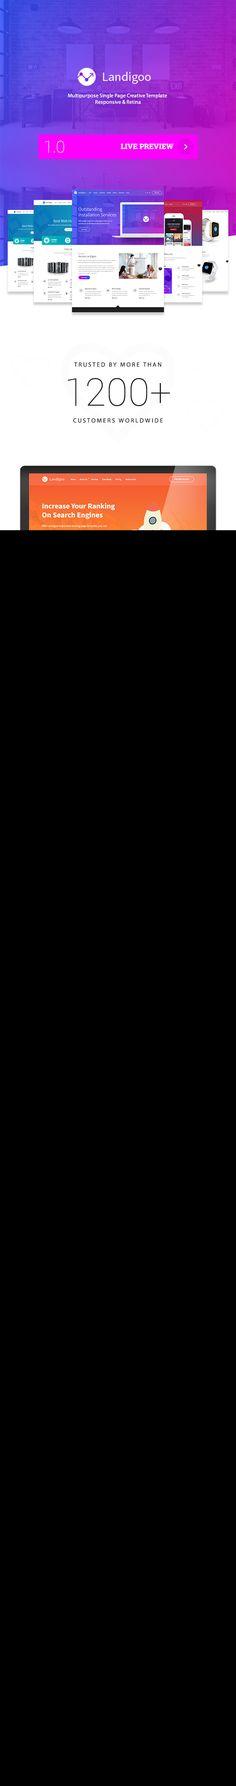 Landigoo - Multipurpose Single Page Creative WP Theme #wordpress • Download ➝ https://themeforest.net/item/landigoo-multipurpose-single-page-creative-wp-theme/19167944?ref=pxcr